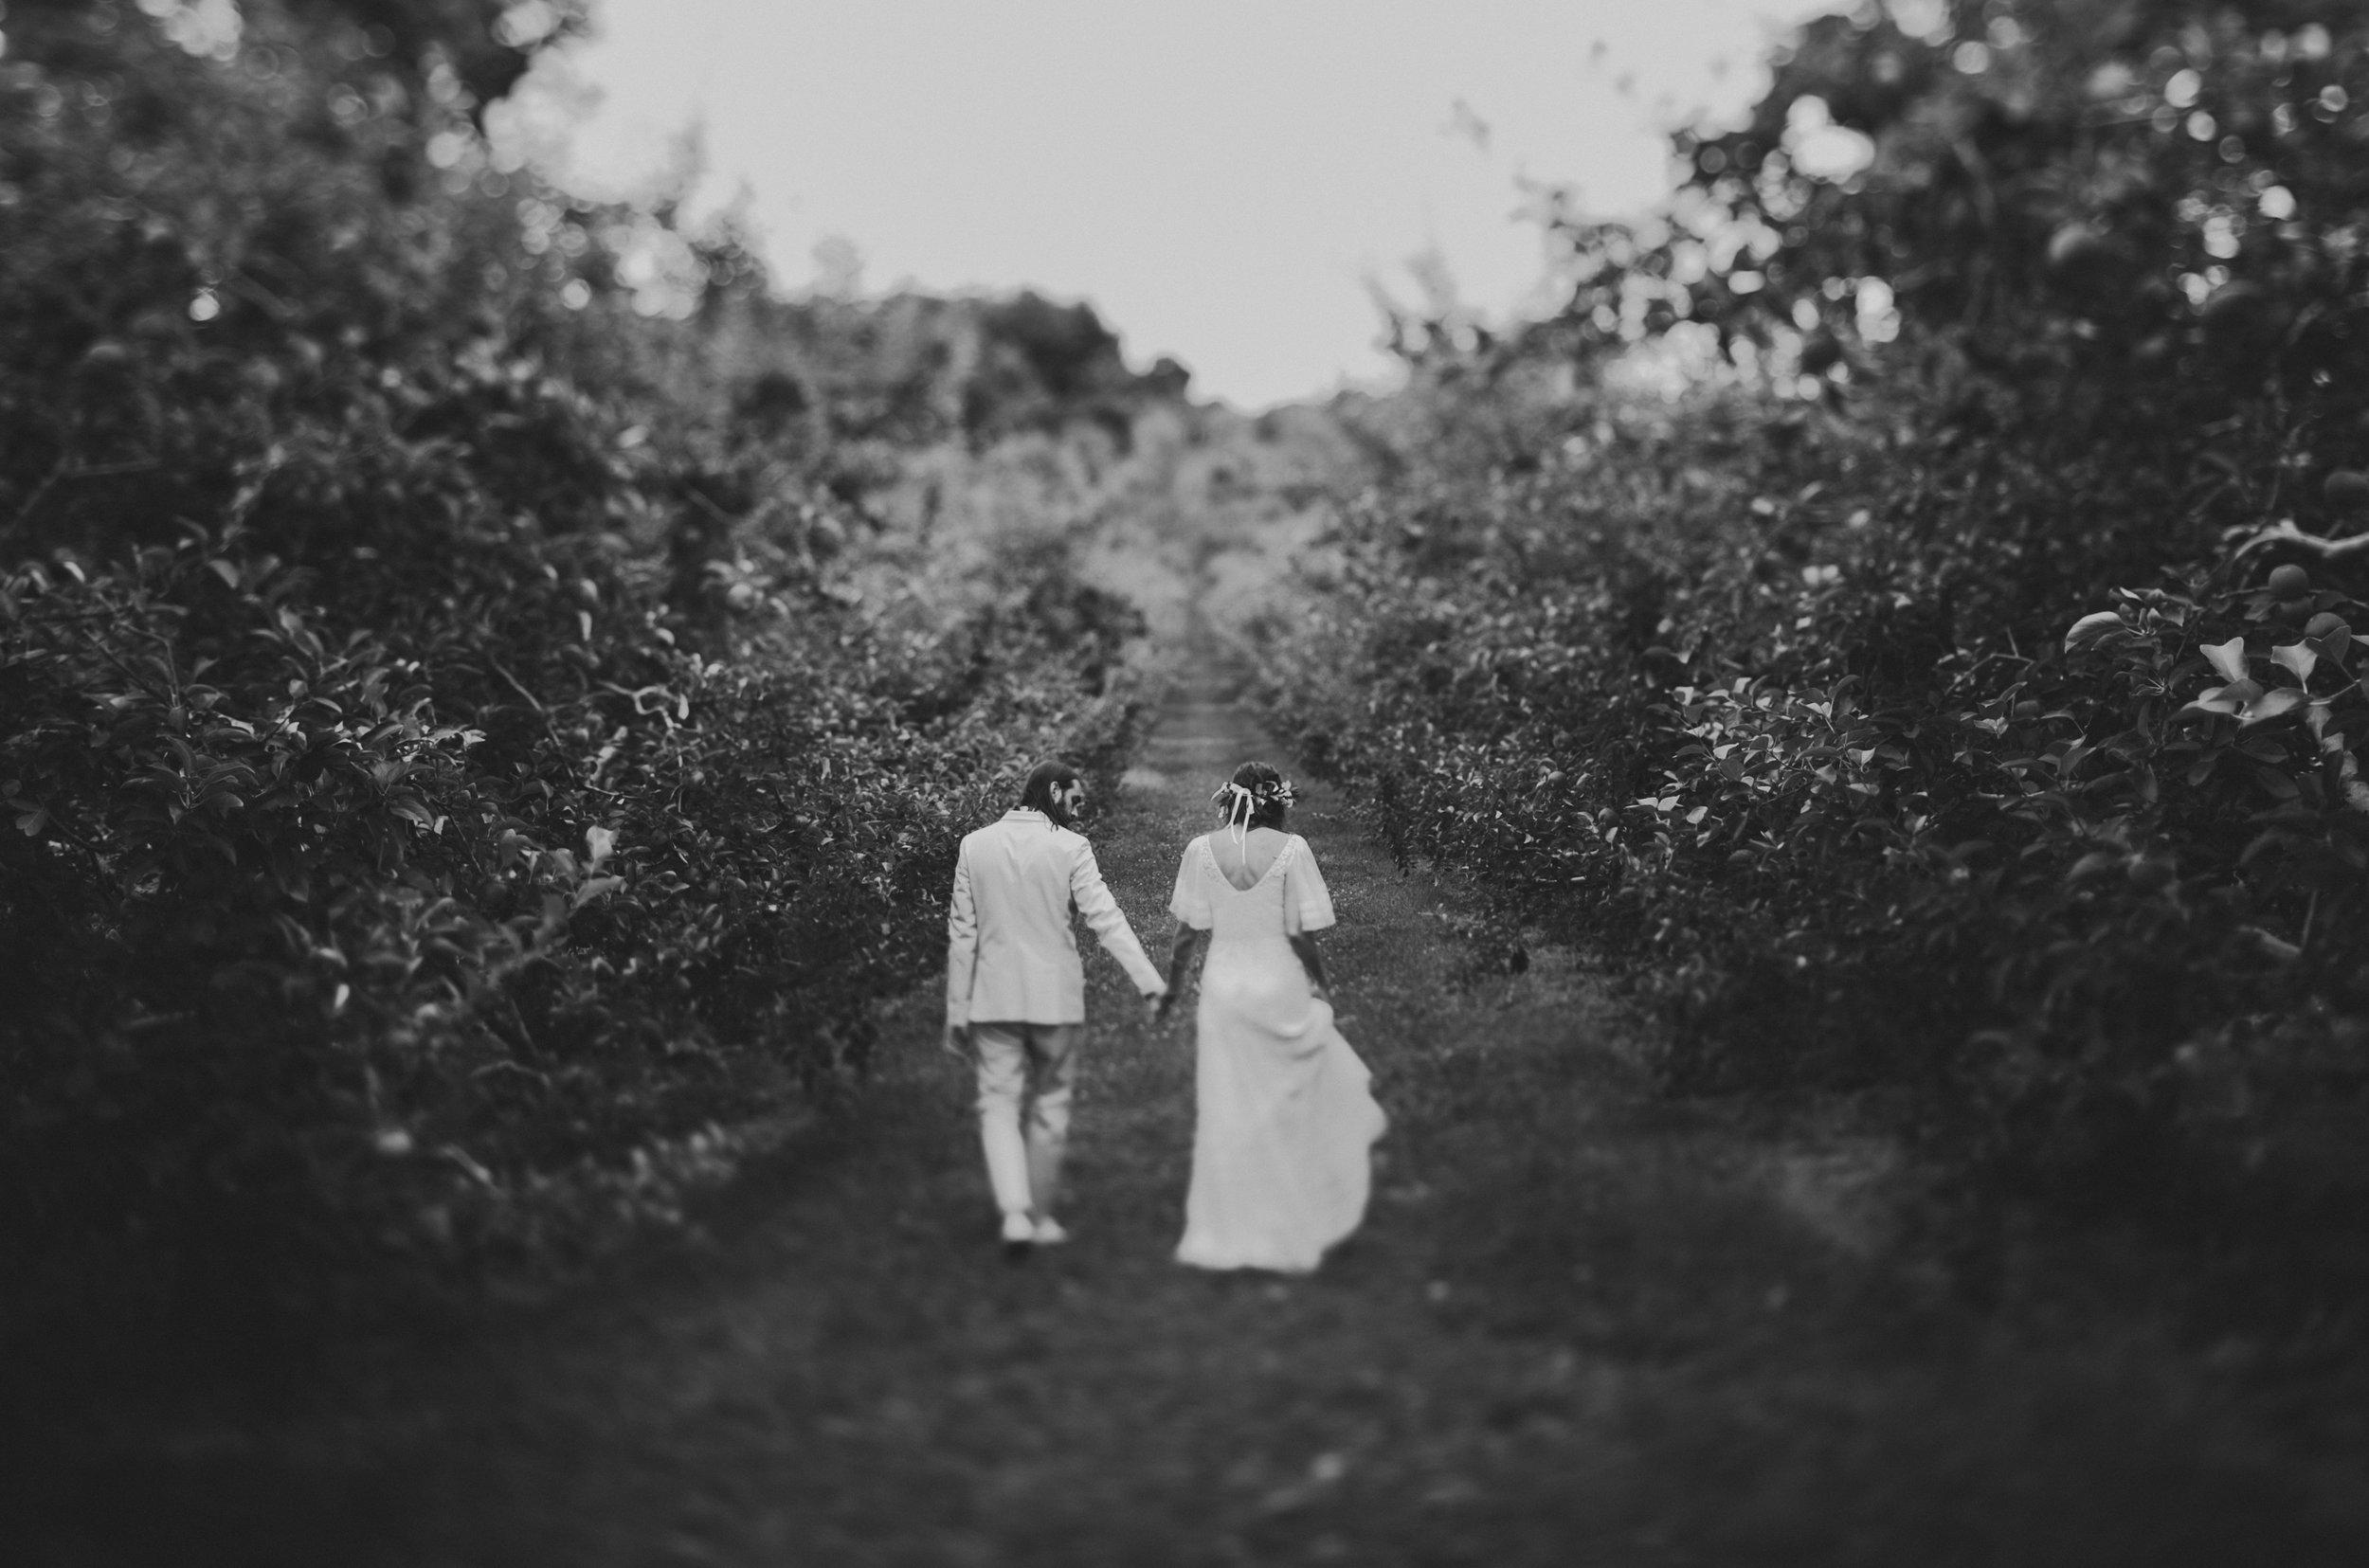 LIBERTY_VIEW_FARM_HIGHLAND_NY_WEDDING_CHELLISE_MICHAEL_PHOTOGRAPHY795.JPG